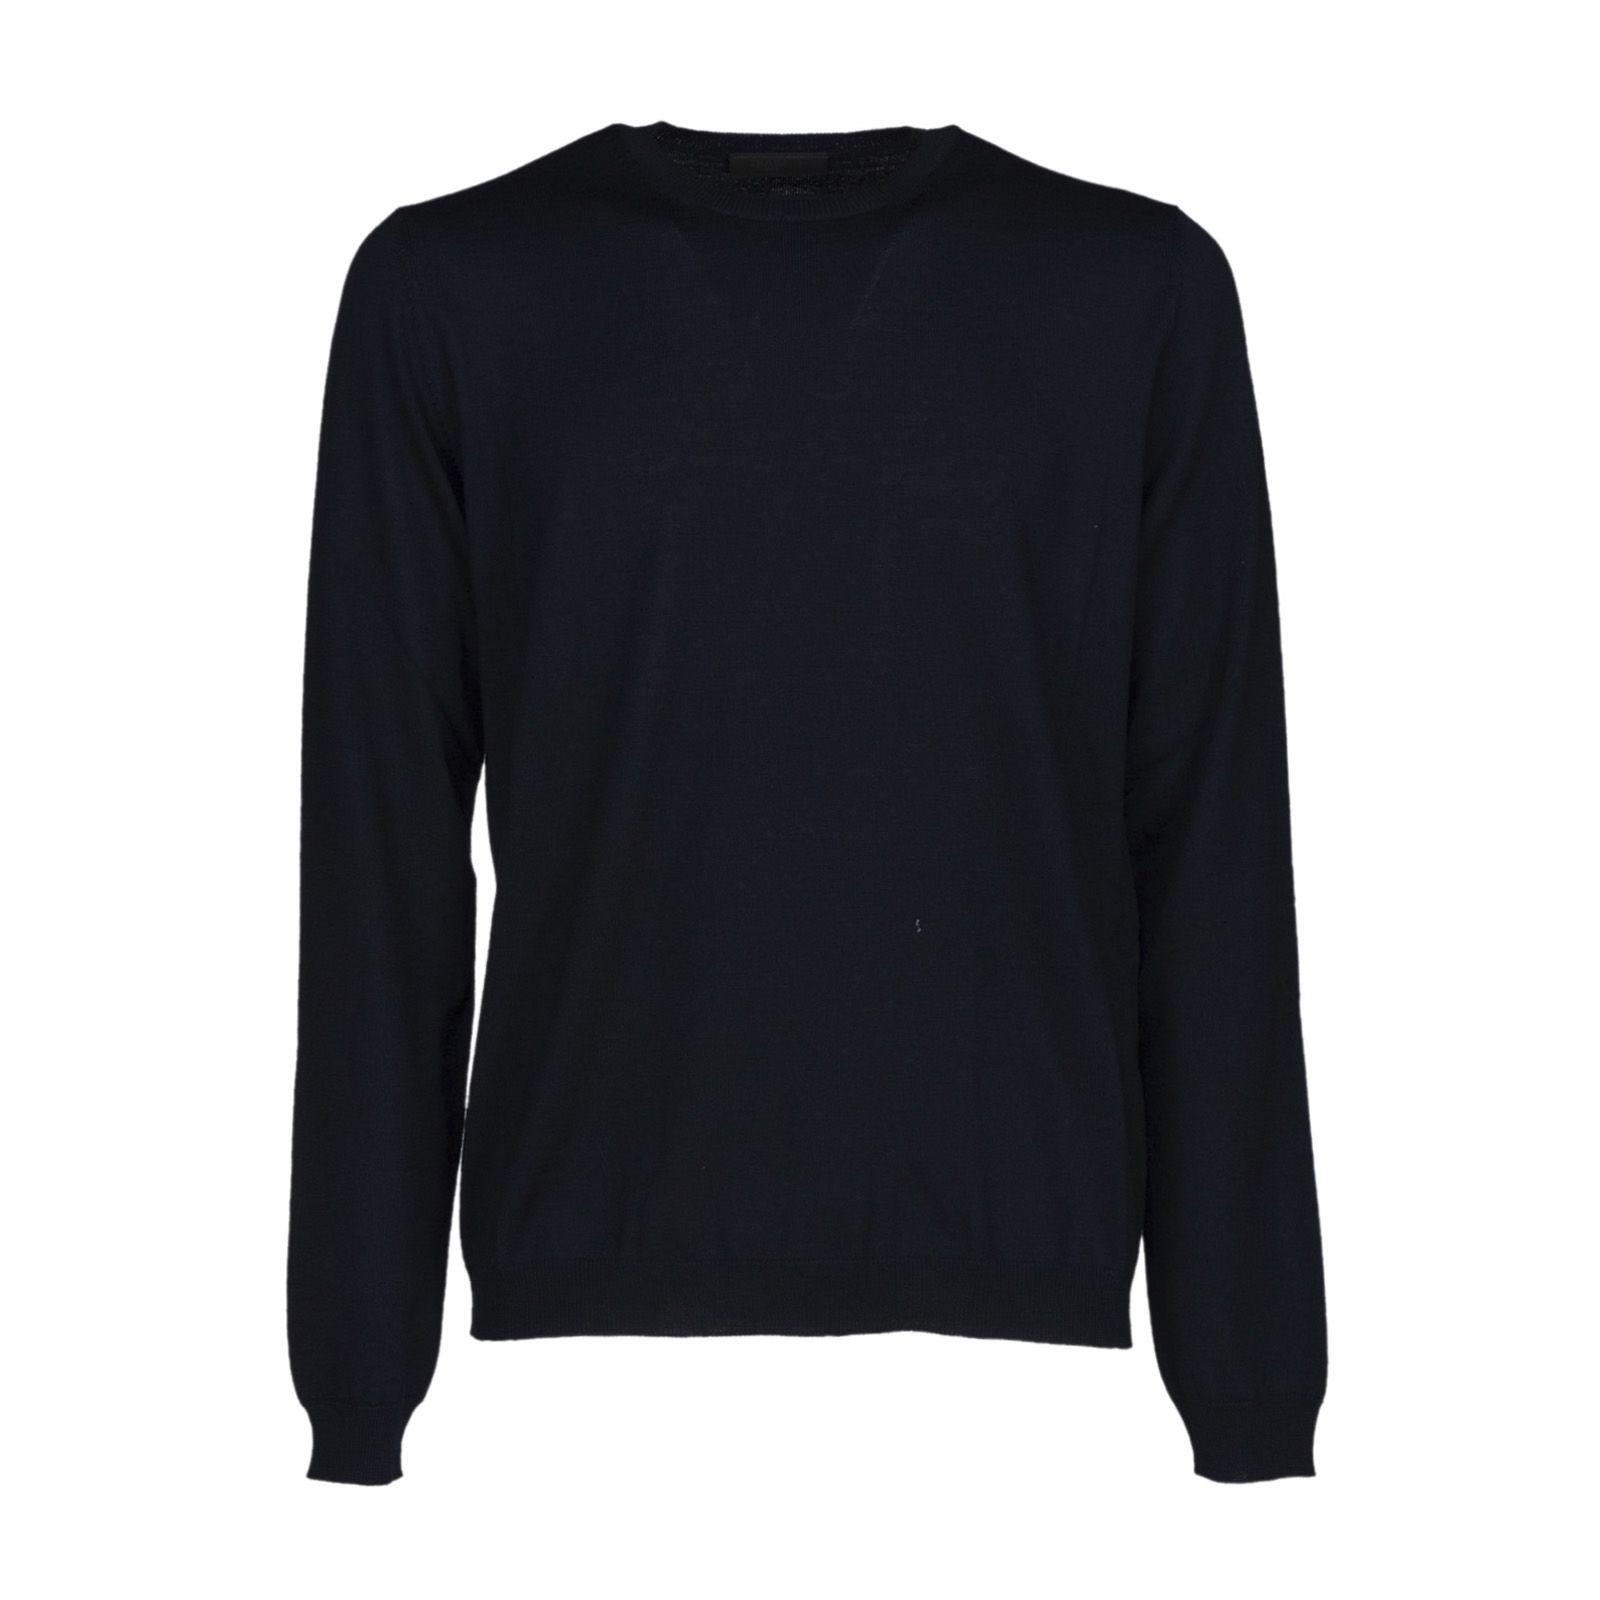 Prada Wools CREW NECK SWEATER